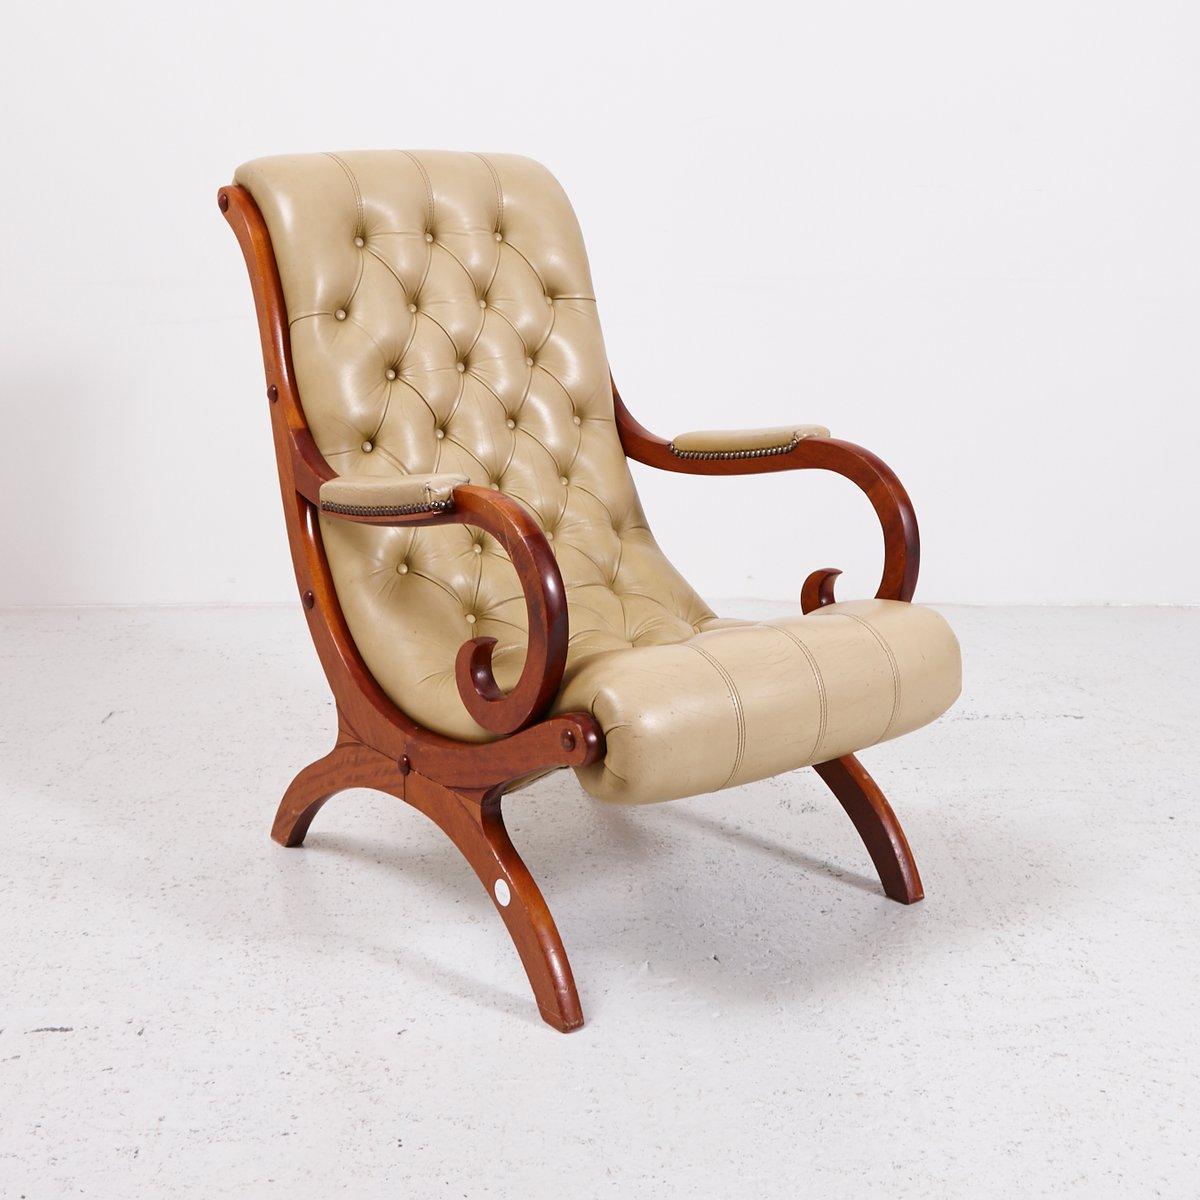 vintage chesterfield ledersessel bei pamono kaufen. Black Bedroom Furniture Sets. Home Design Ideas